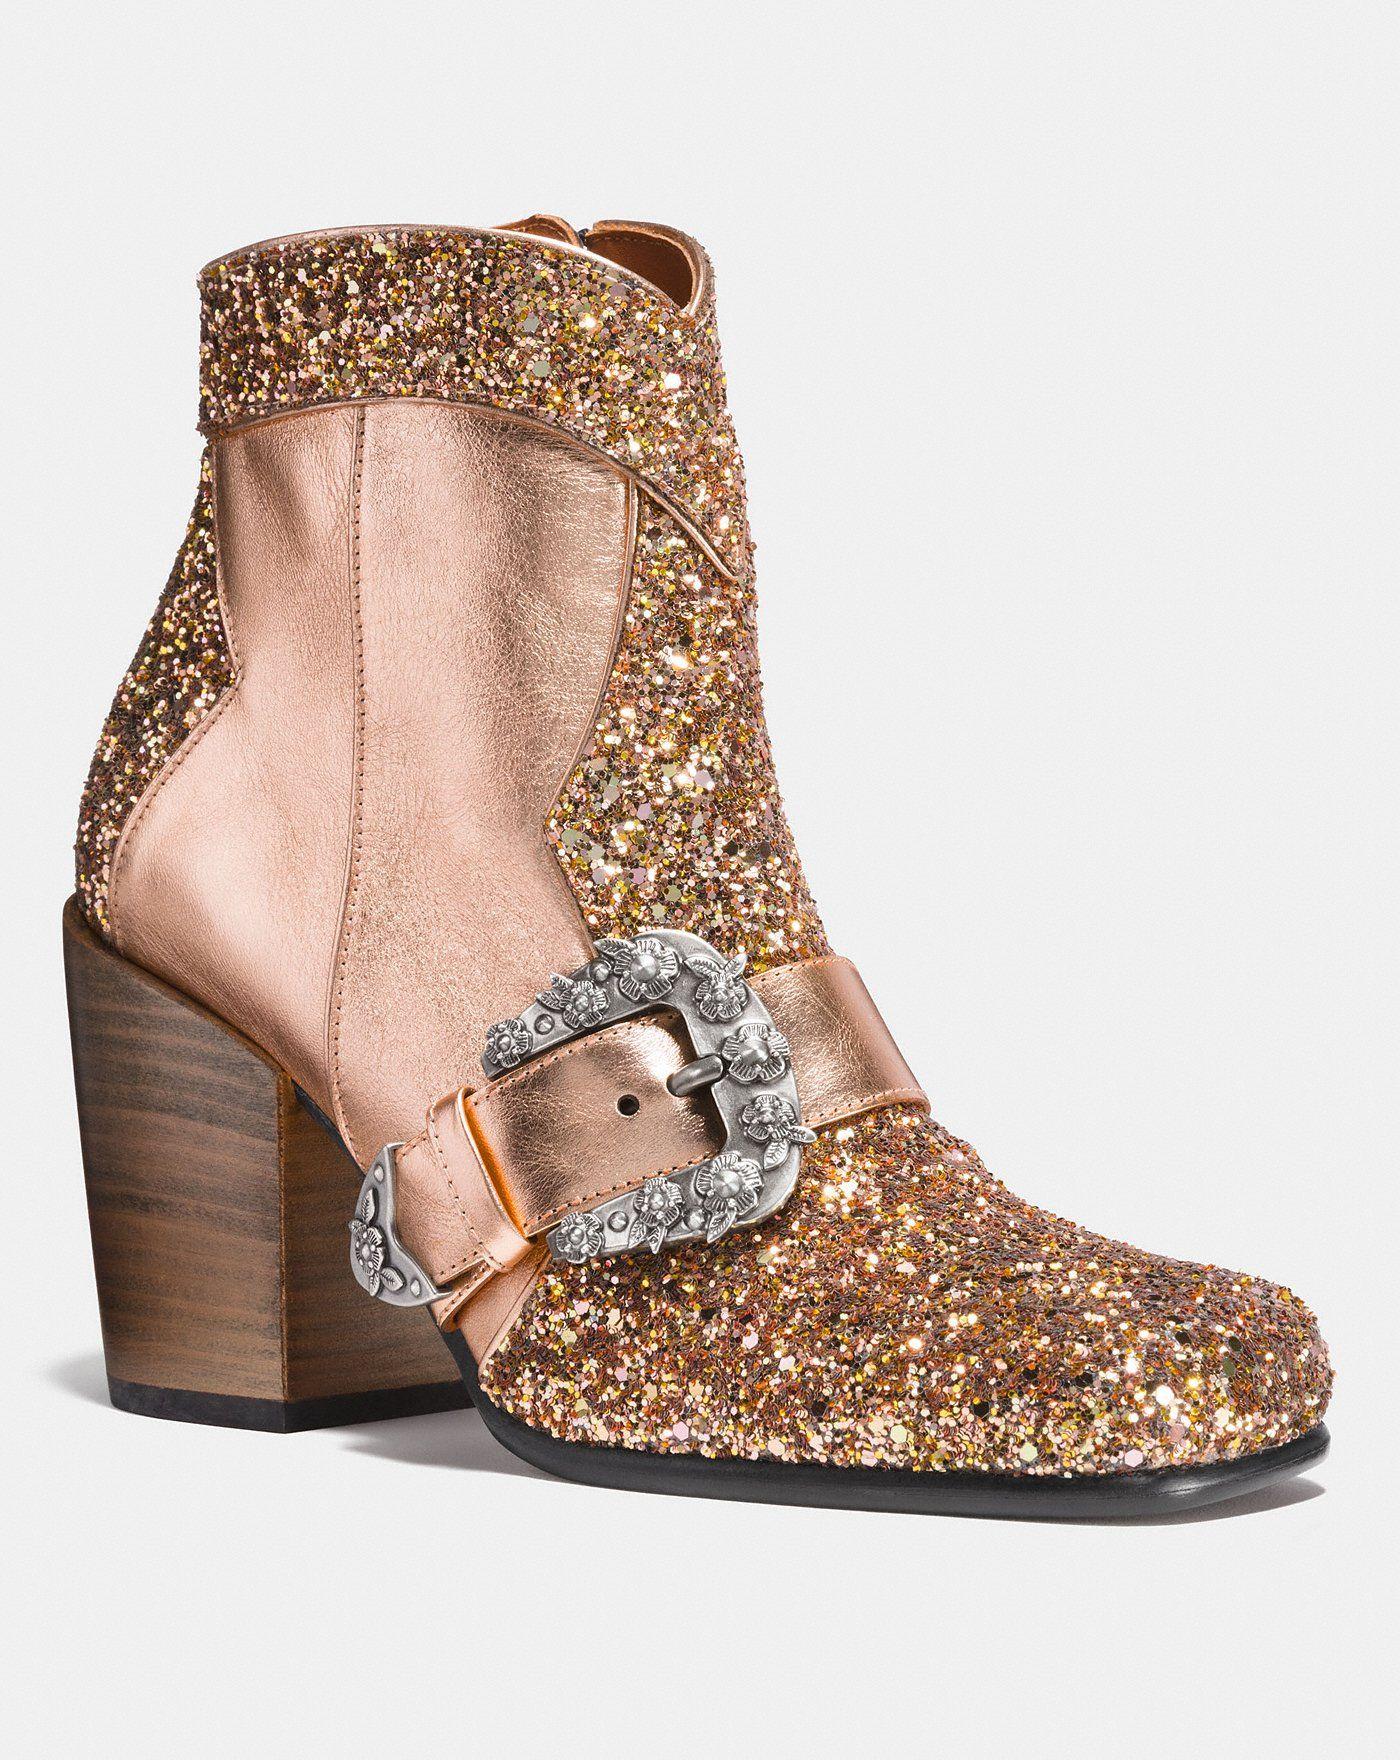 a7235b94575 Western Buckle Bootie   Shoes - Boots   Cowboy shoes, Ankle cowboy ...